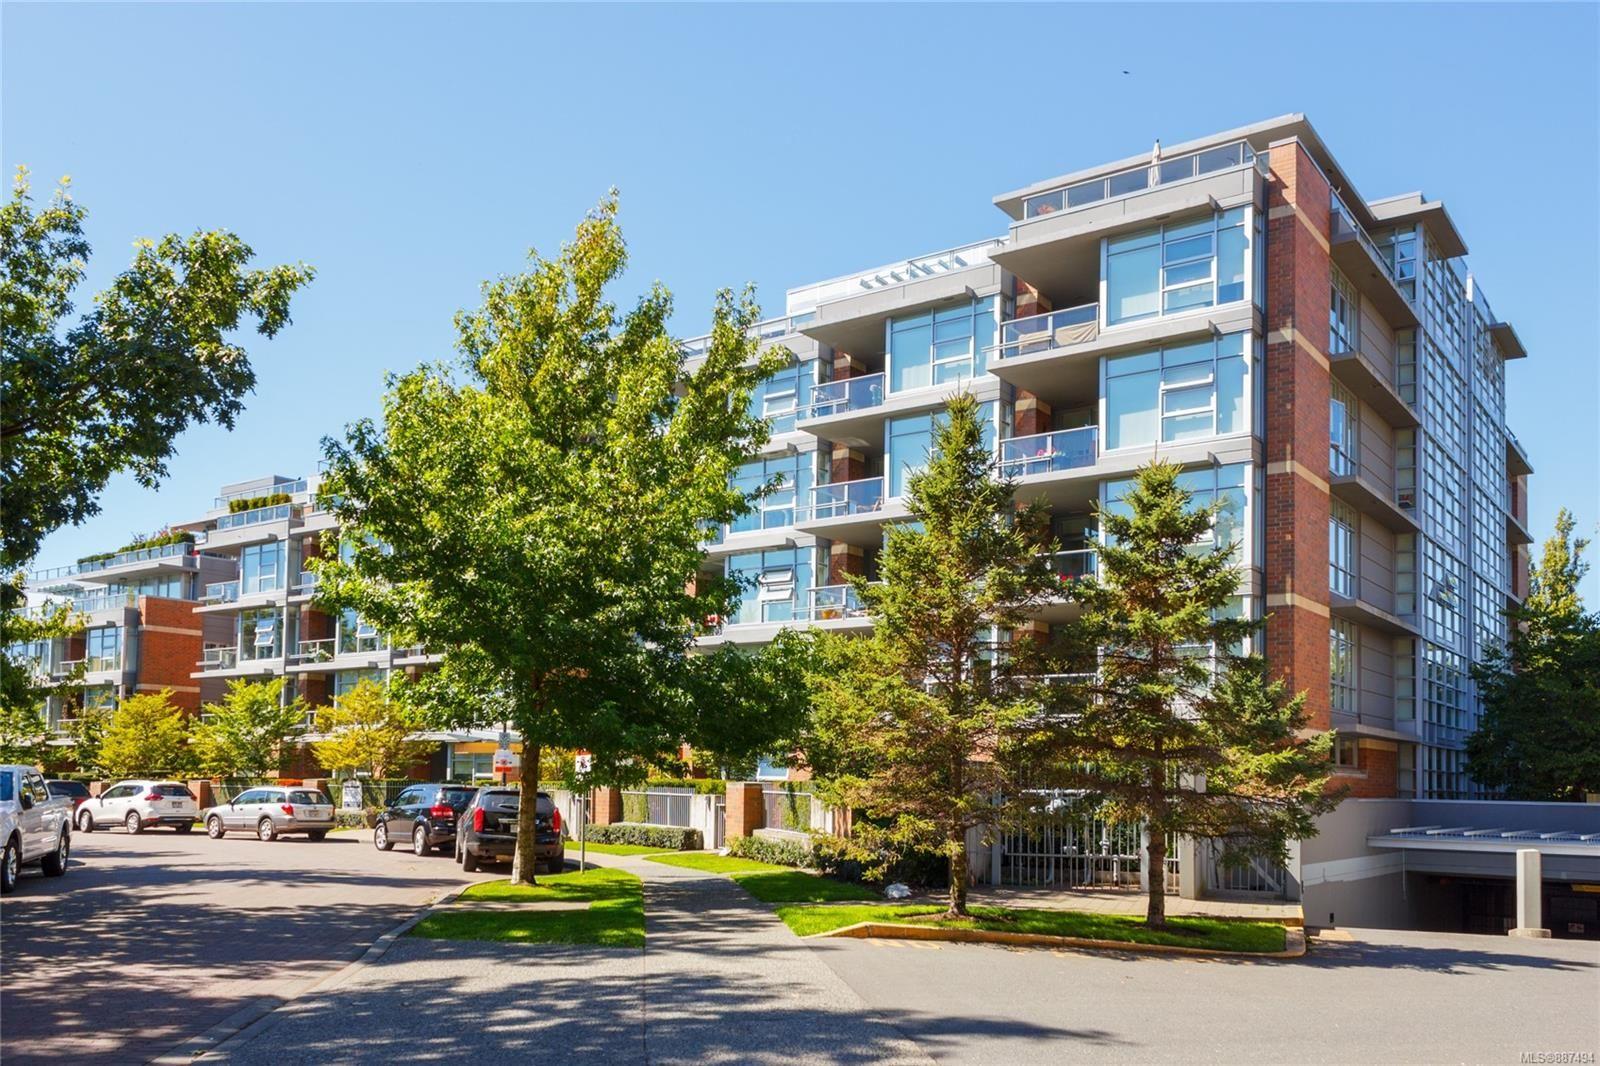 Main Photo: 409 365 Waterfront Cres in Victoria: Vi Rock Bay Condo for sale : MLS®# 887494